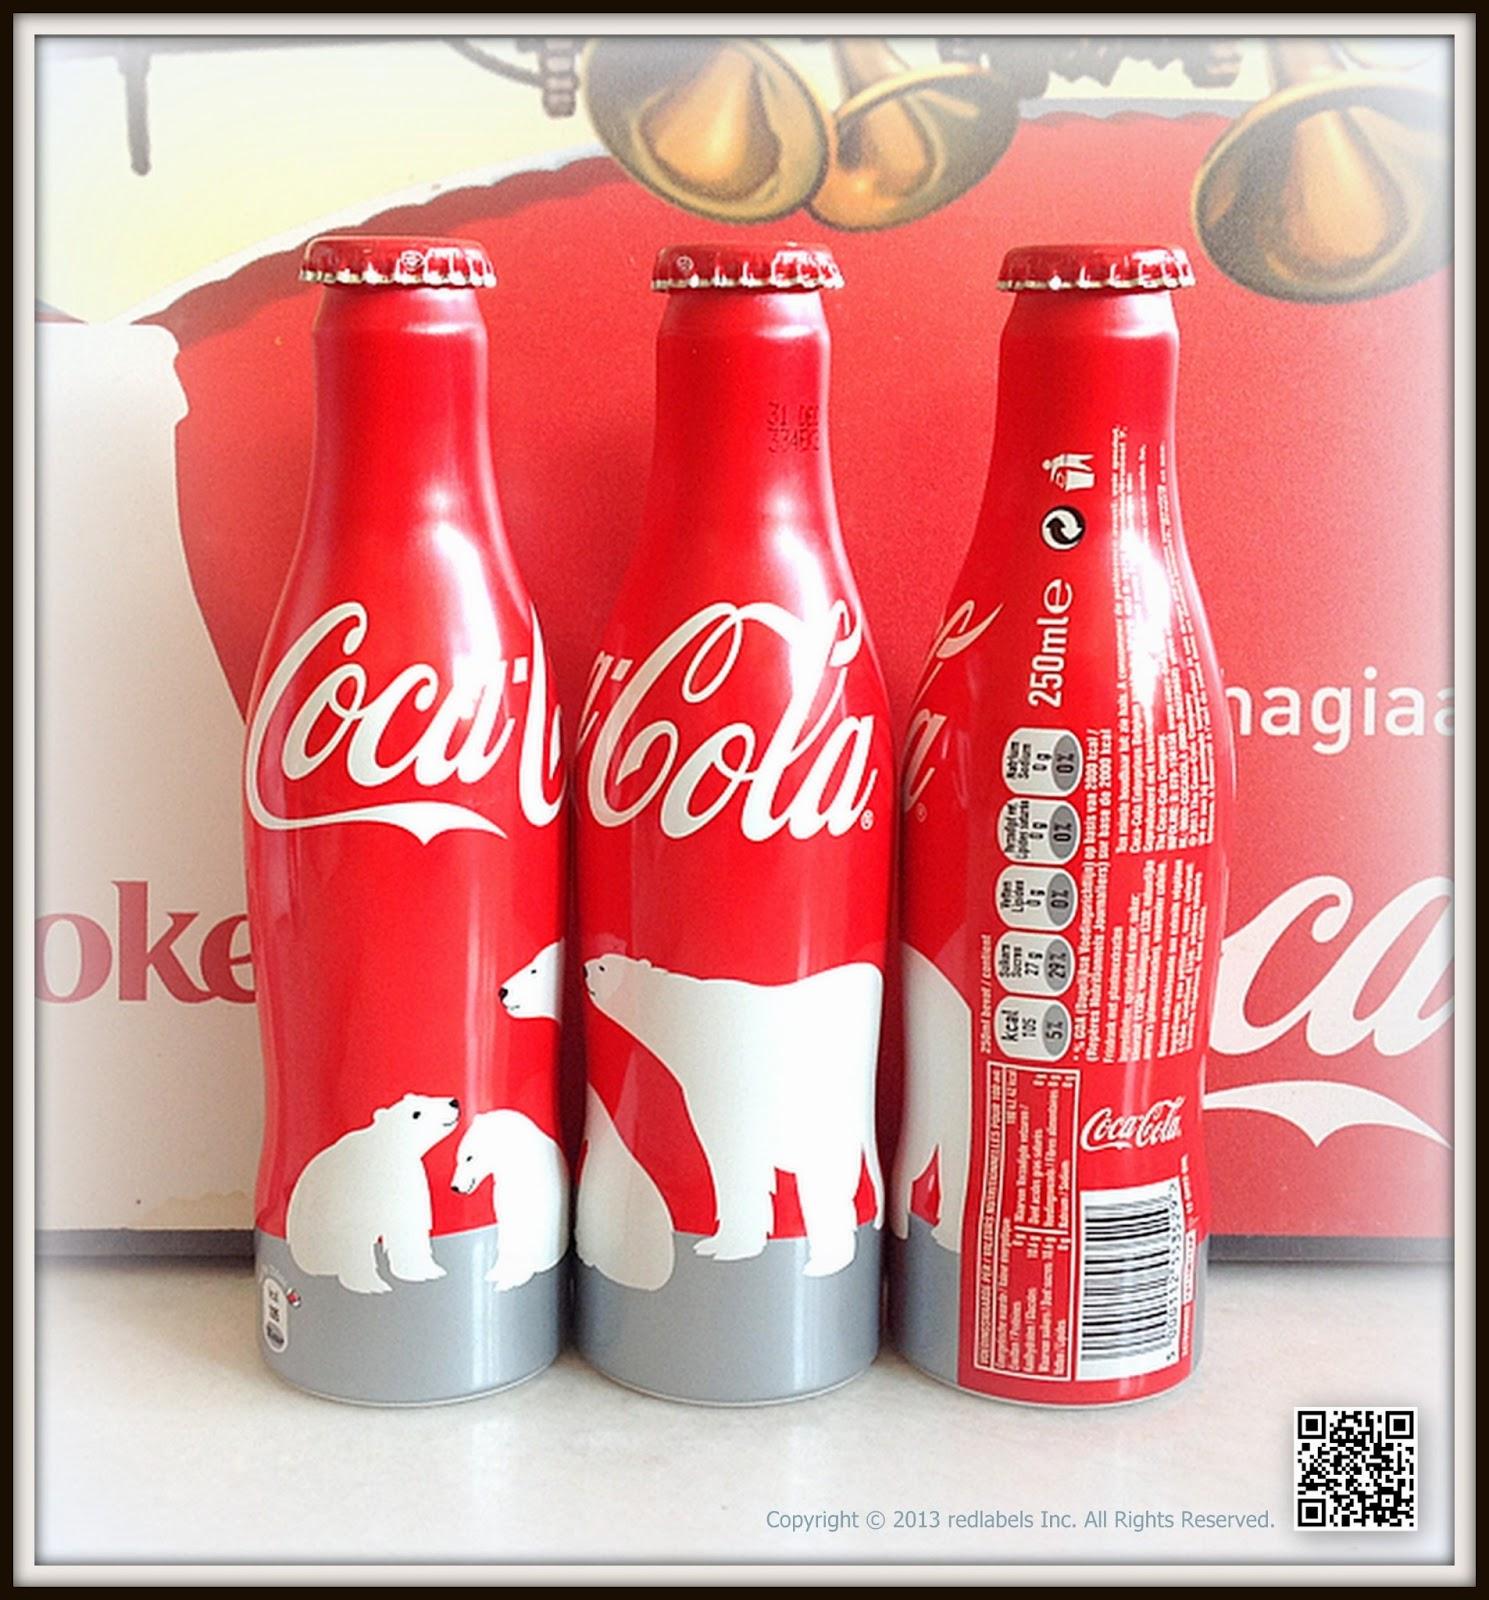 aluminum bottle collector club coca cola arctic home polar bear aluminum bottle 2013 belgium. Black Bedroom Furniture Sets. Home Design Ideas